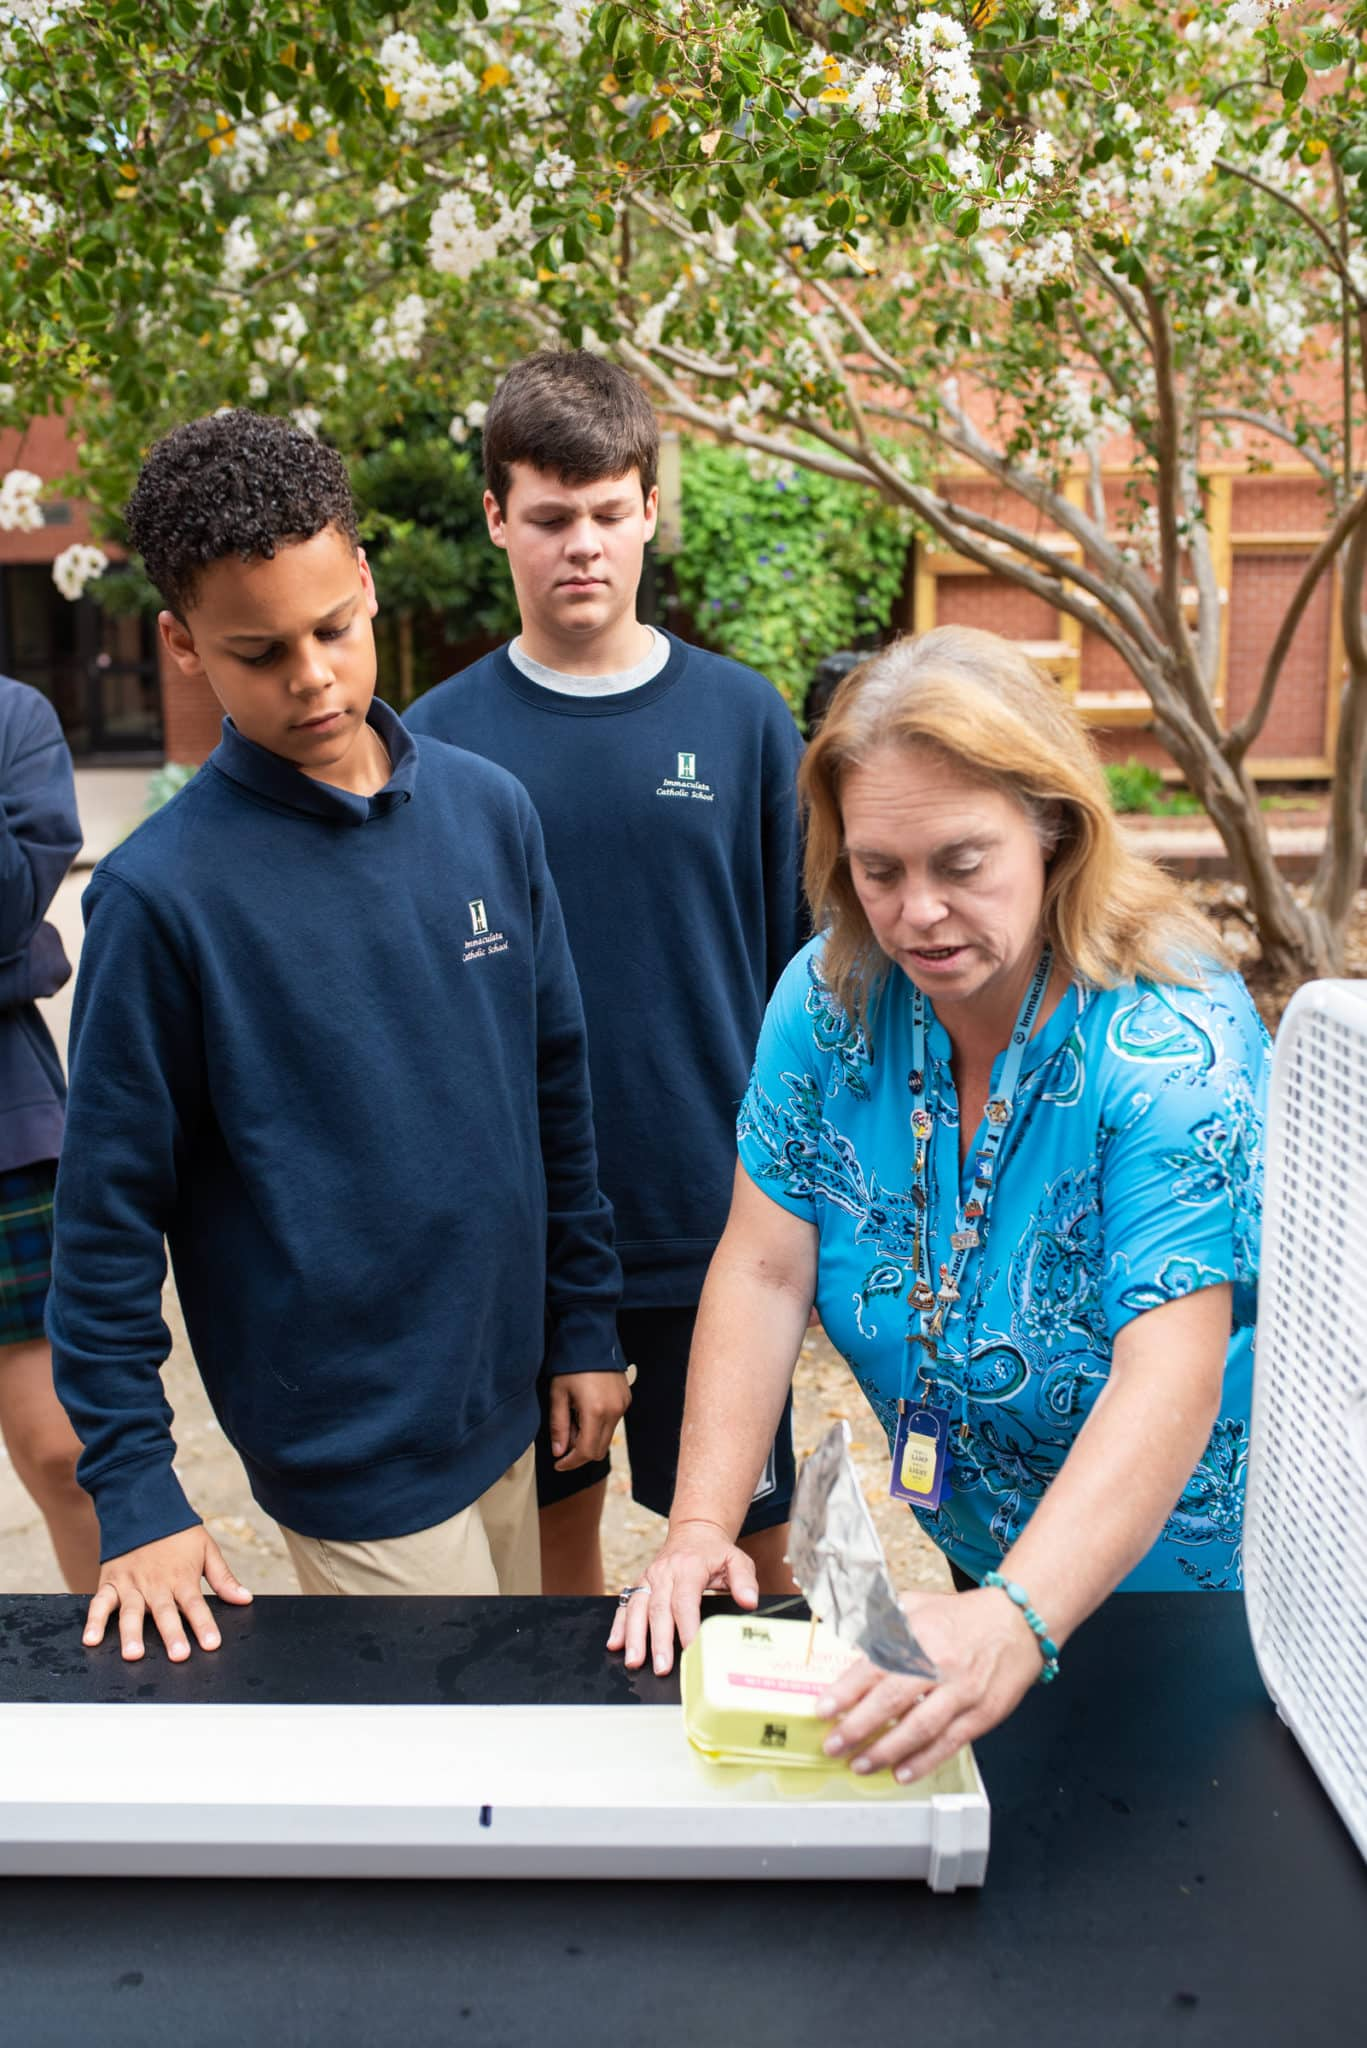 Immaculata Catholic School's STEM director Karen Kingrea